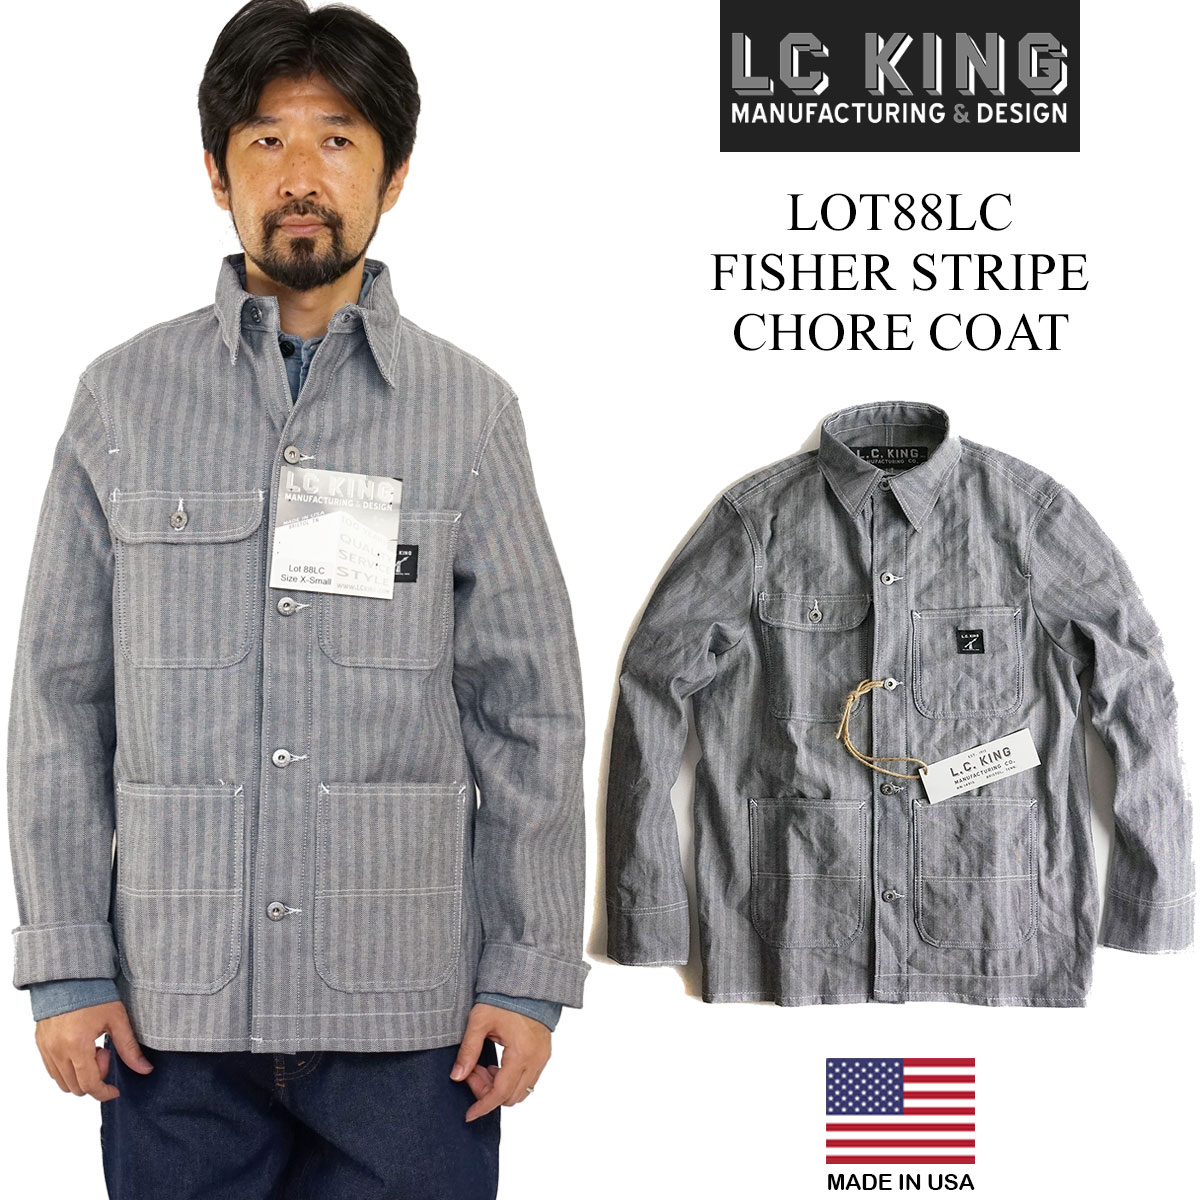 L.C.キング LOT88LC カバーオール フィッシャーストライプ MADE IN USA (米国製 アメリカ製 ヘリンボーン L.C.KING)